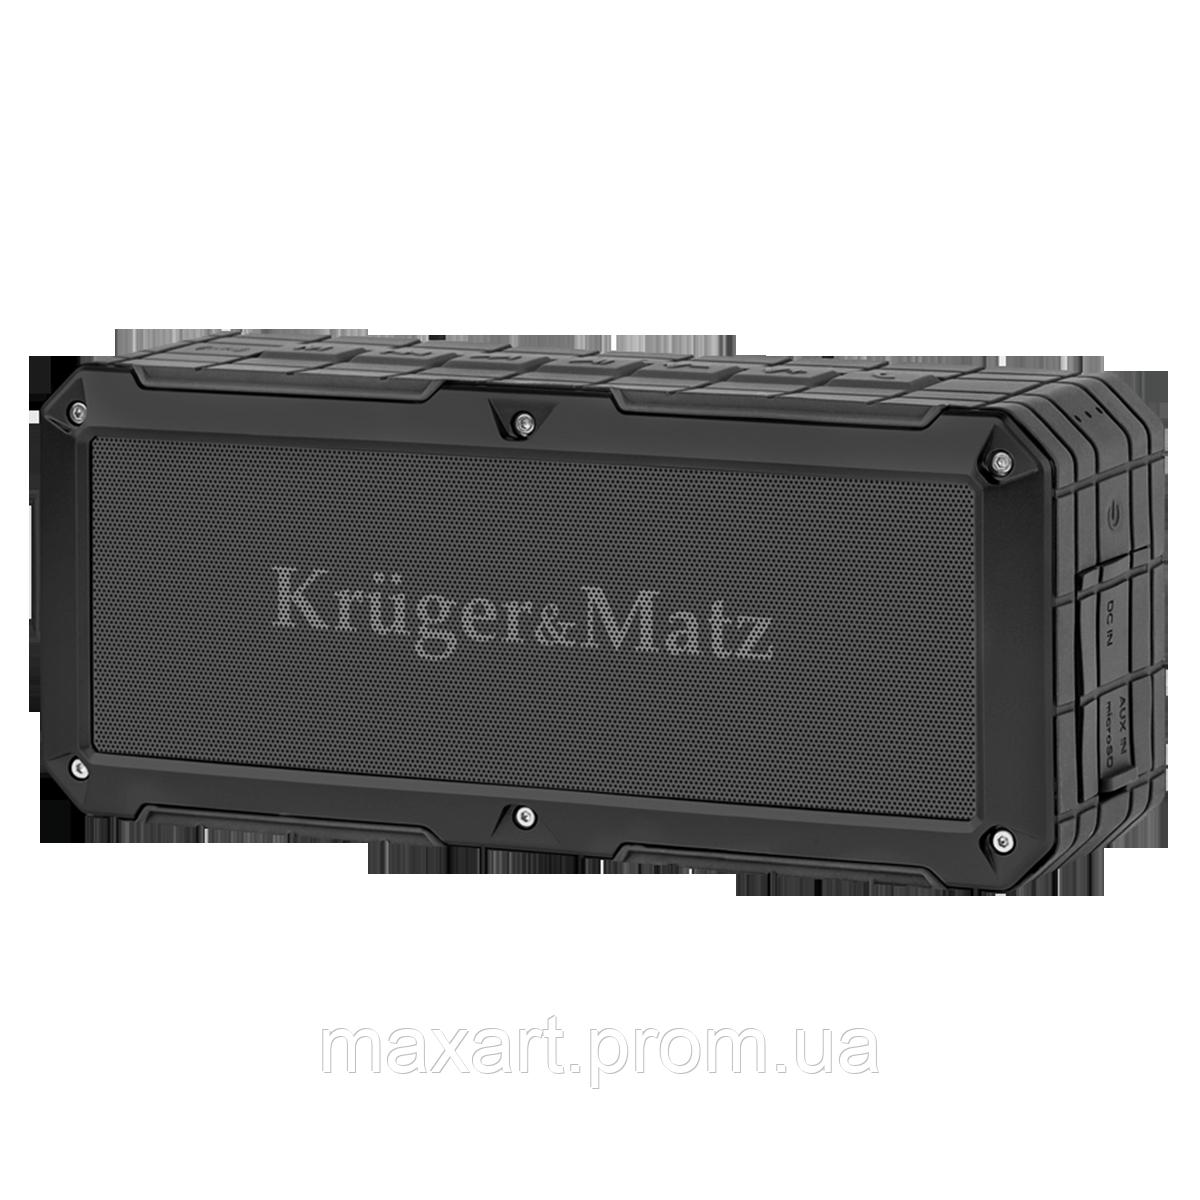 Колонка Kruger&Matz - DISCOVERY (KM0523B) Black